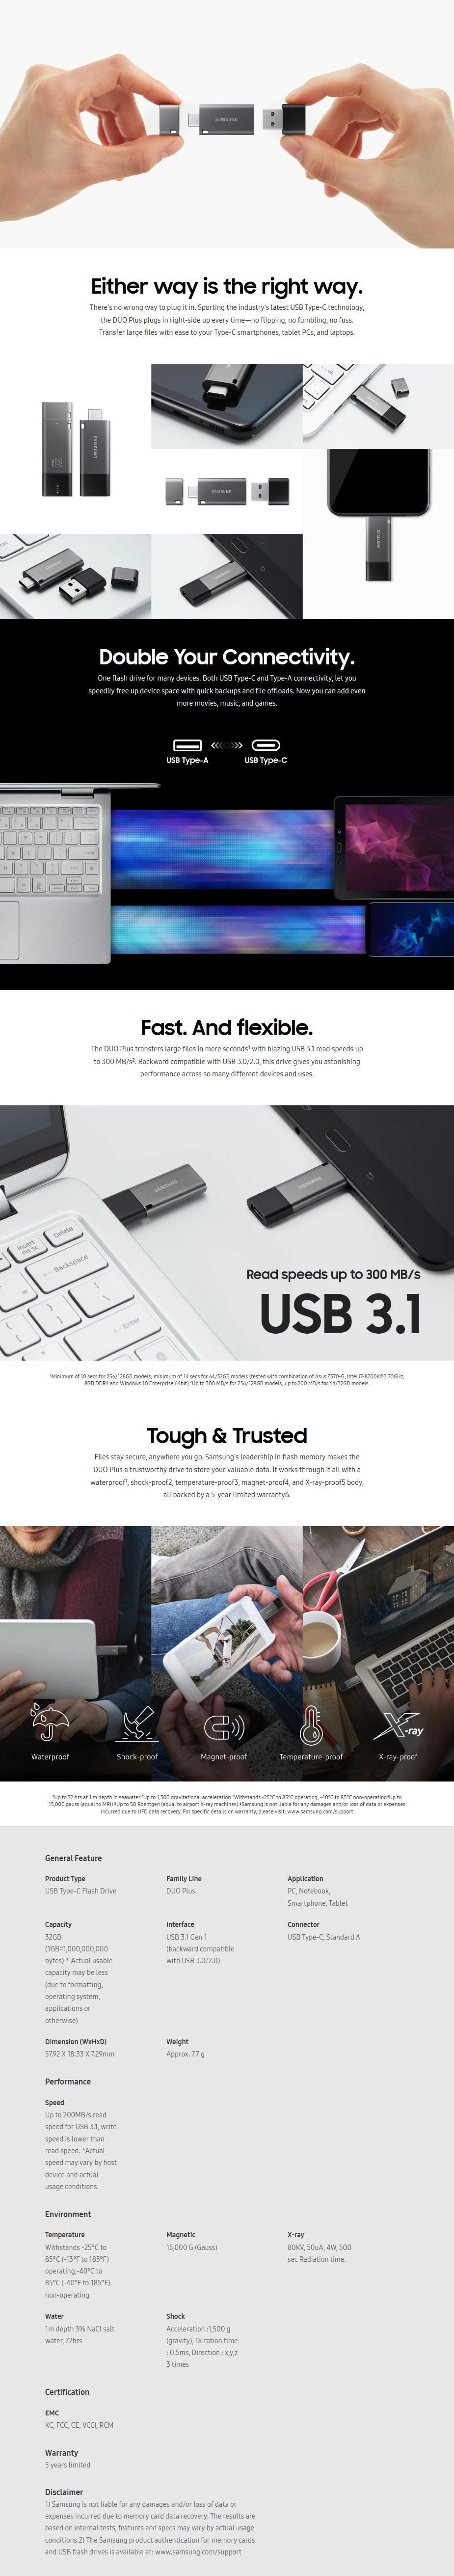 Samsung MUF-32DB/APC 32GB DUO Plus USB-C Flash Drive - Overview 1